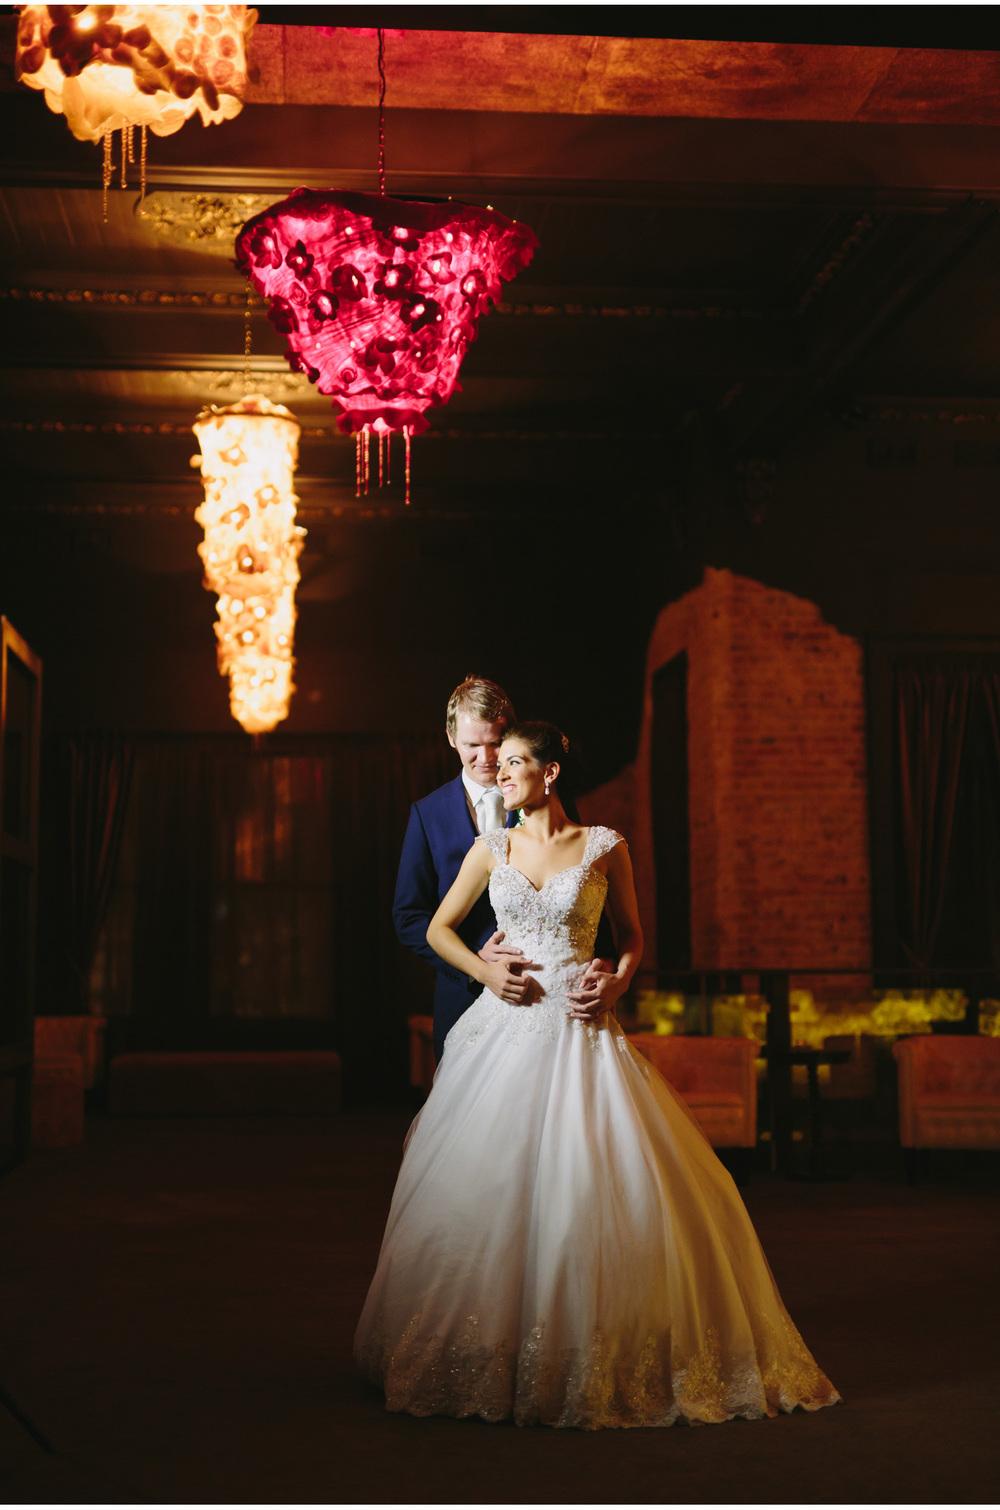 024-andrew-rankin-townsville-wedding-photography.jpg